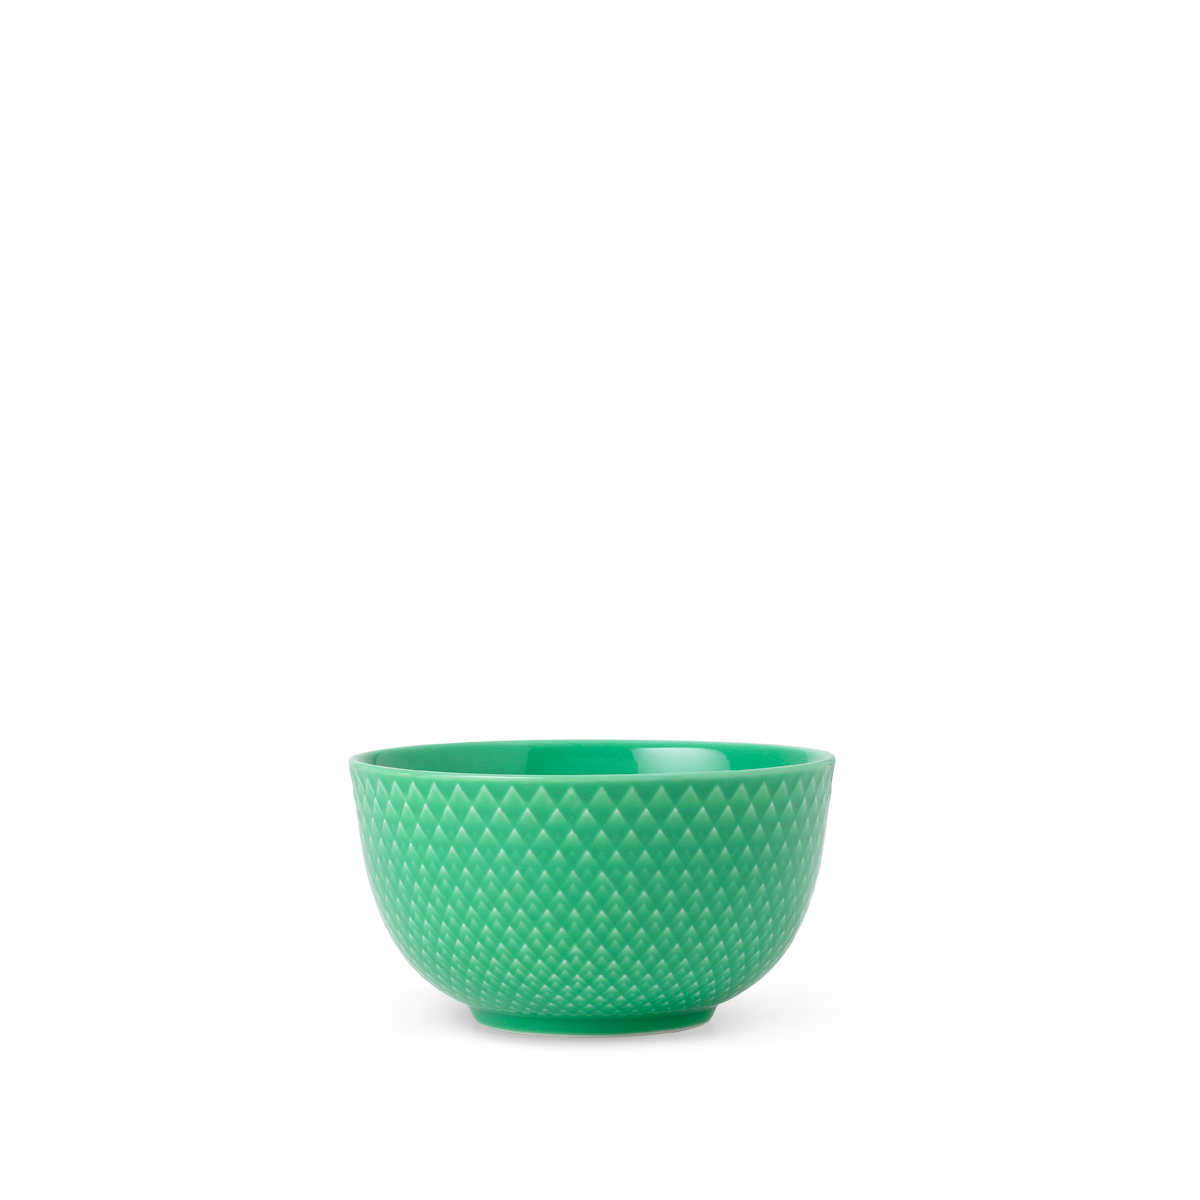 Lyngby Porcelæn - Rhombe Color Bowl Dia. 11cm - Green (201902)